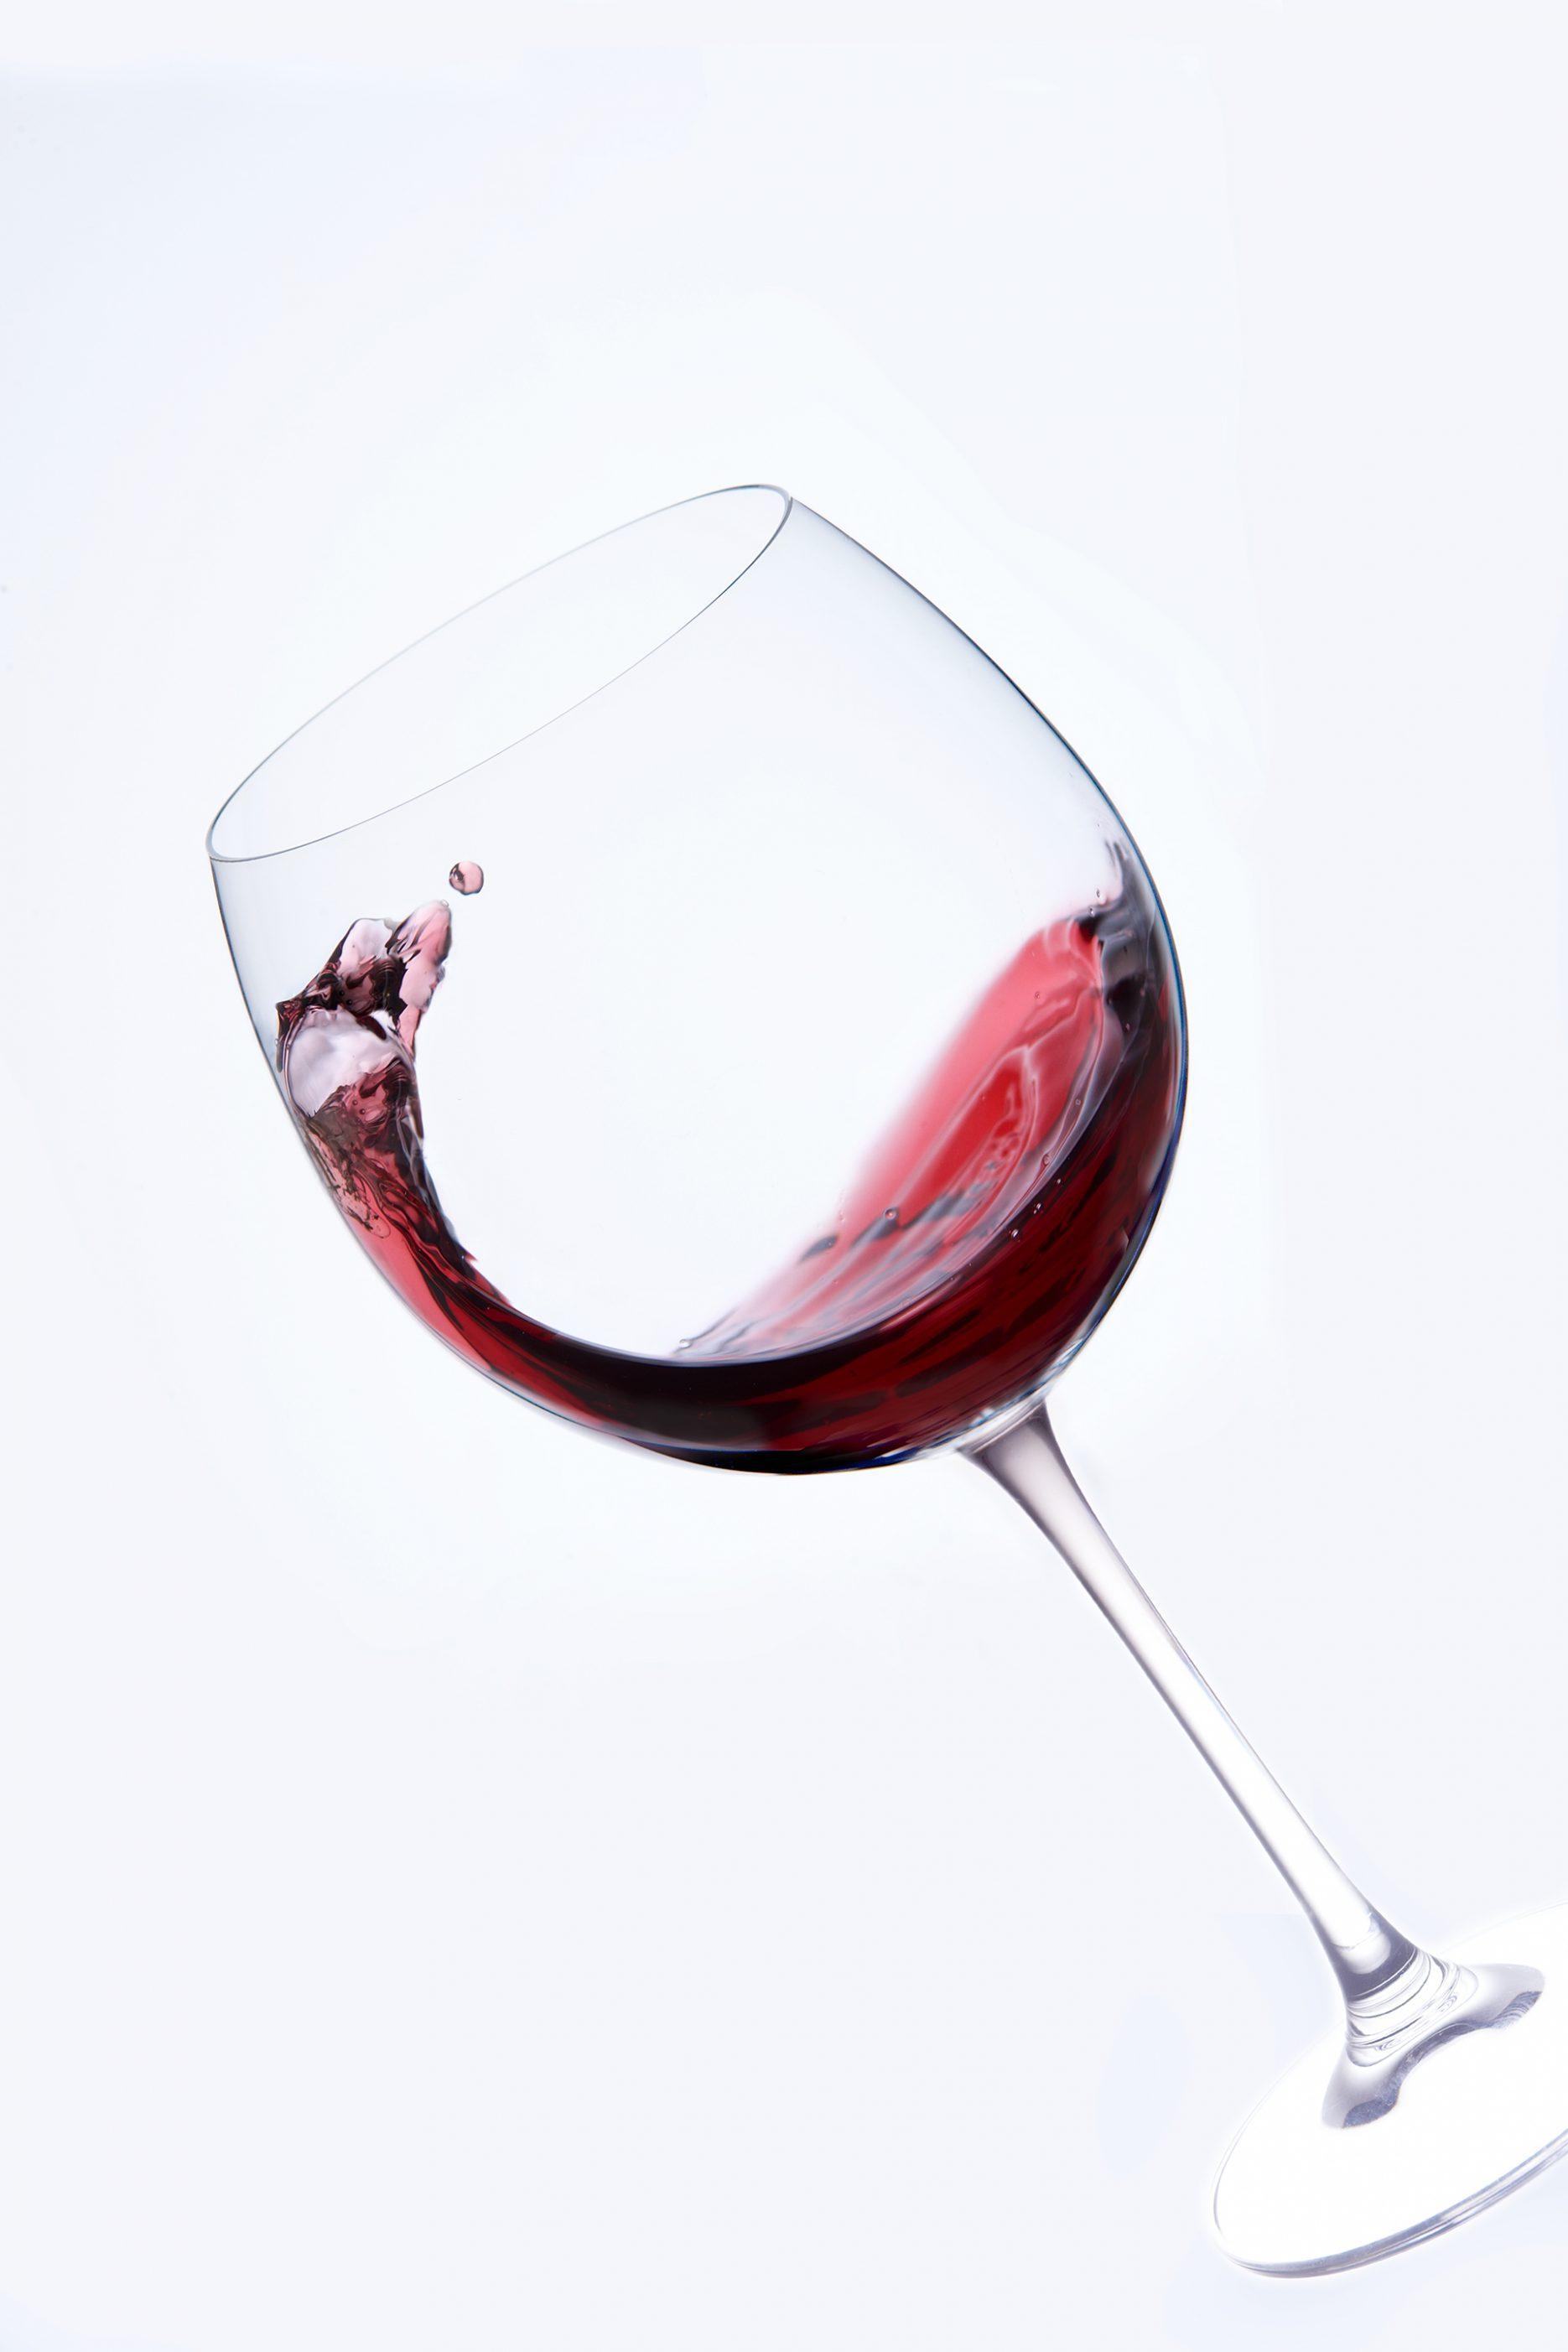 Bildbearbeitung Rotwein